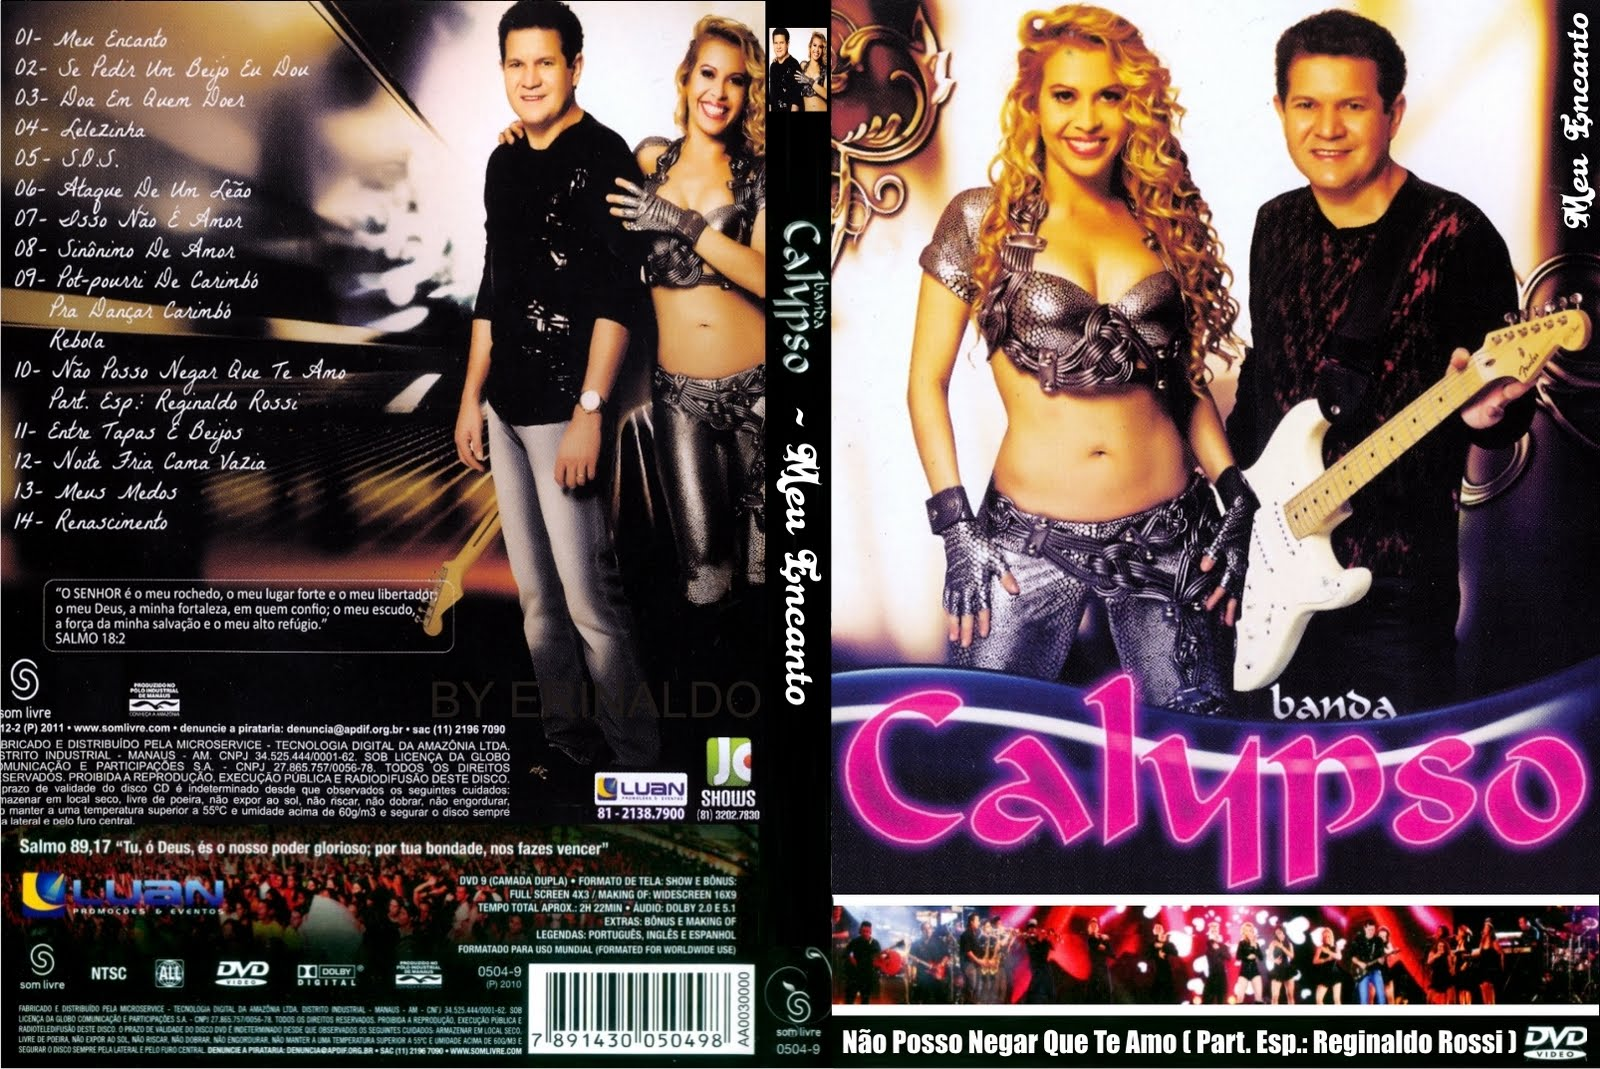 ANGOLA BANDA NOVO BAIXAR NA DVD CALYPSO